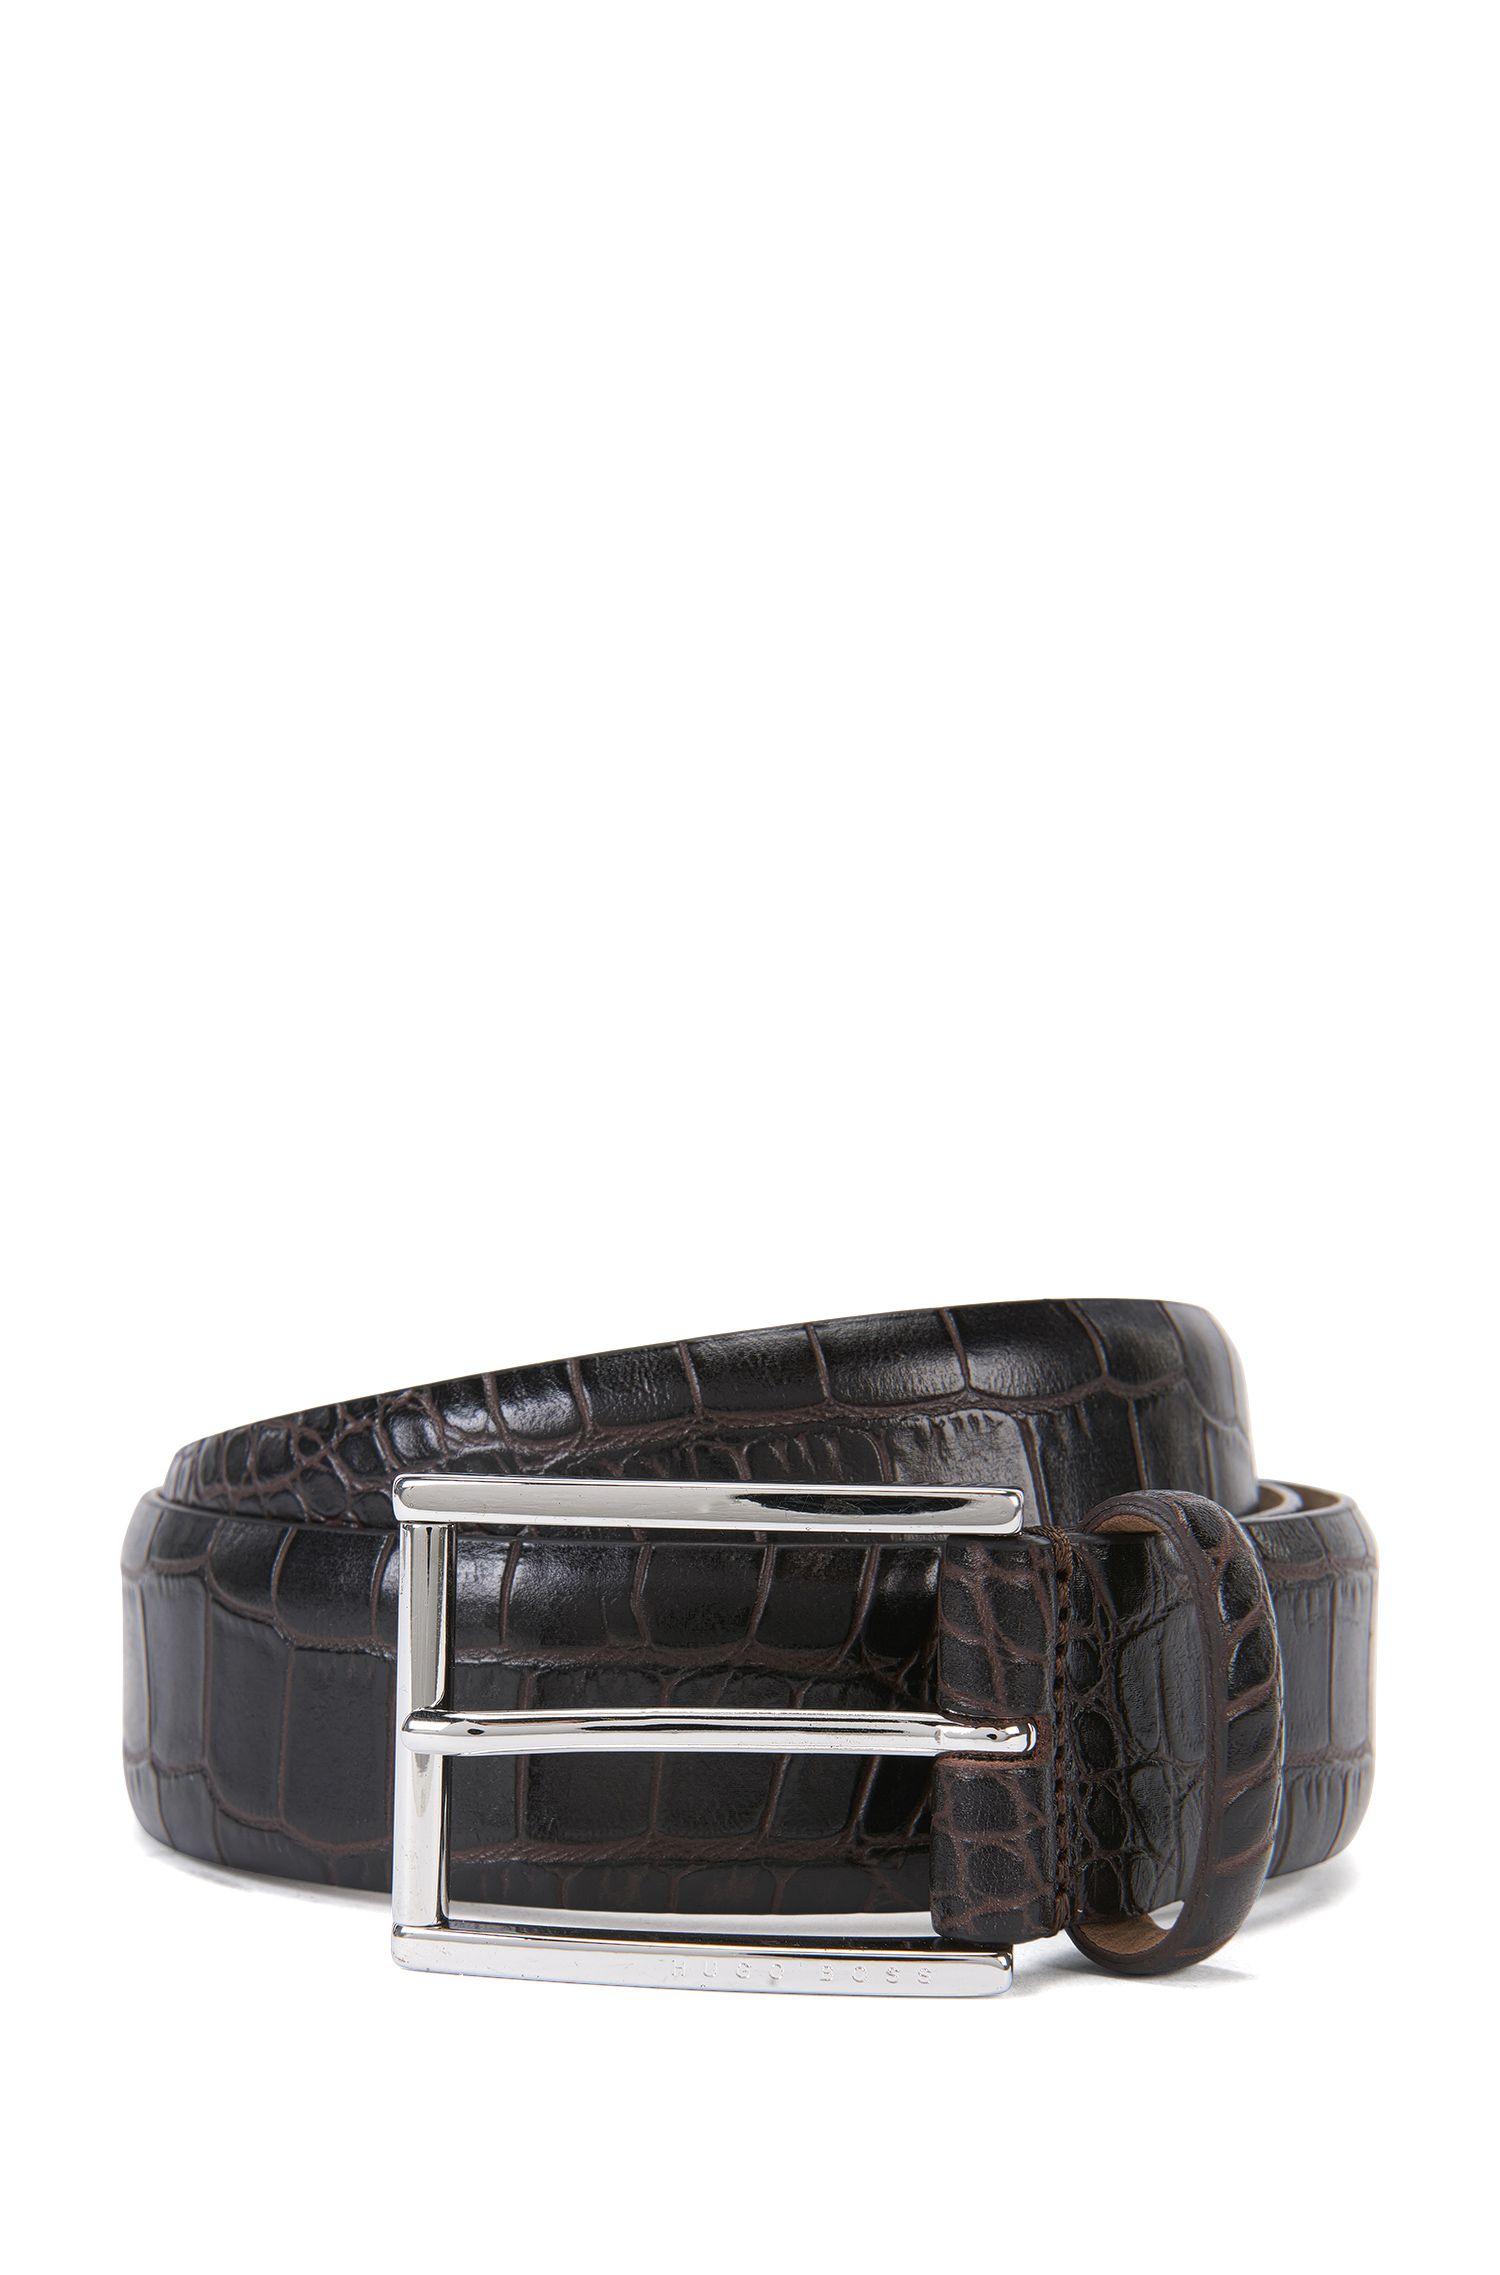 'T-Lelion' | Italian Patent Leather Belt